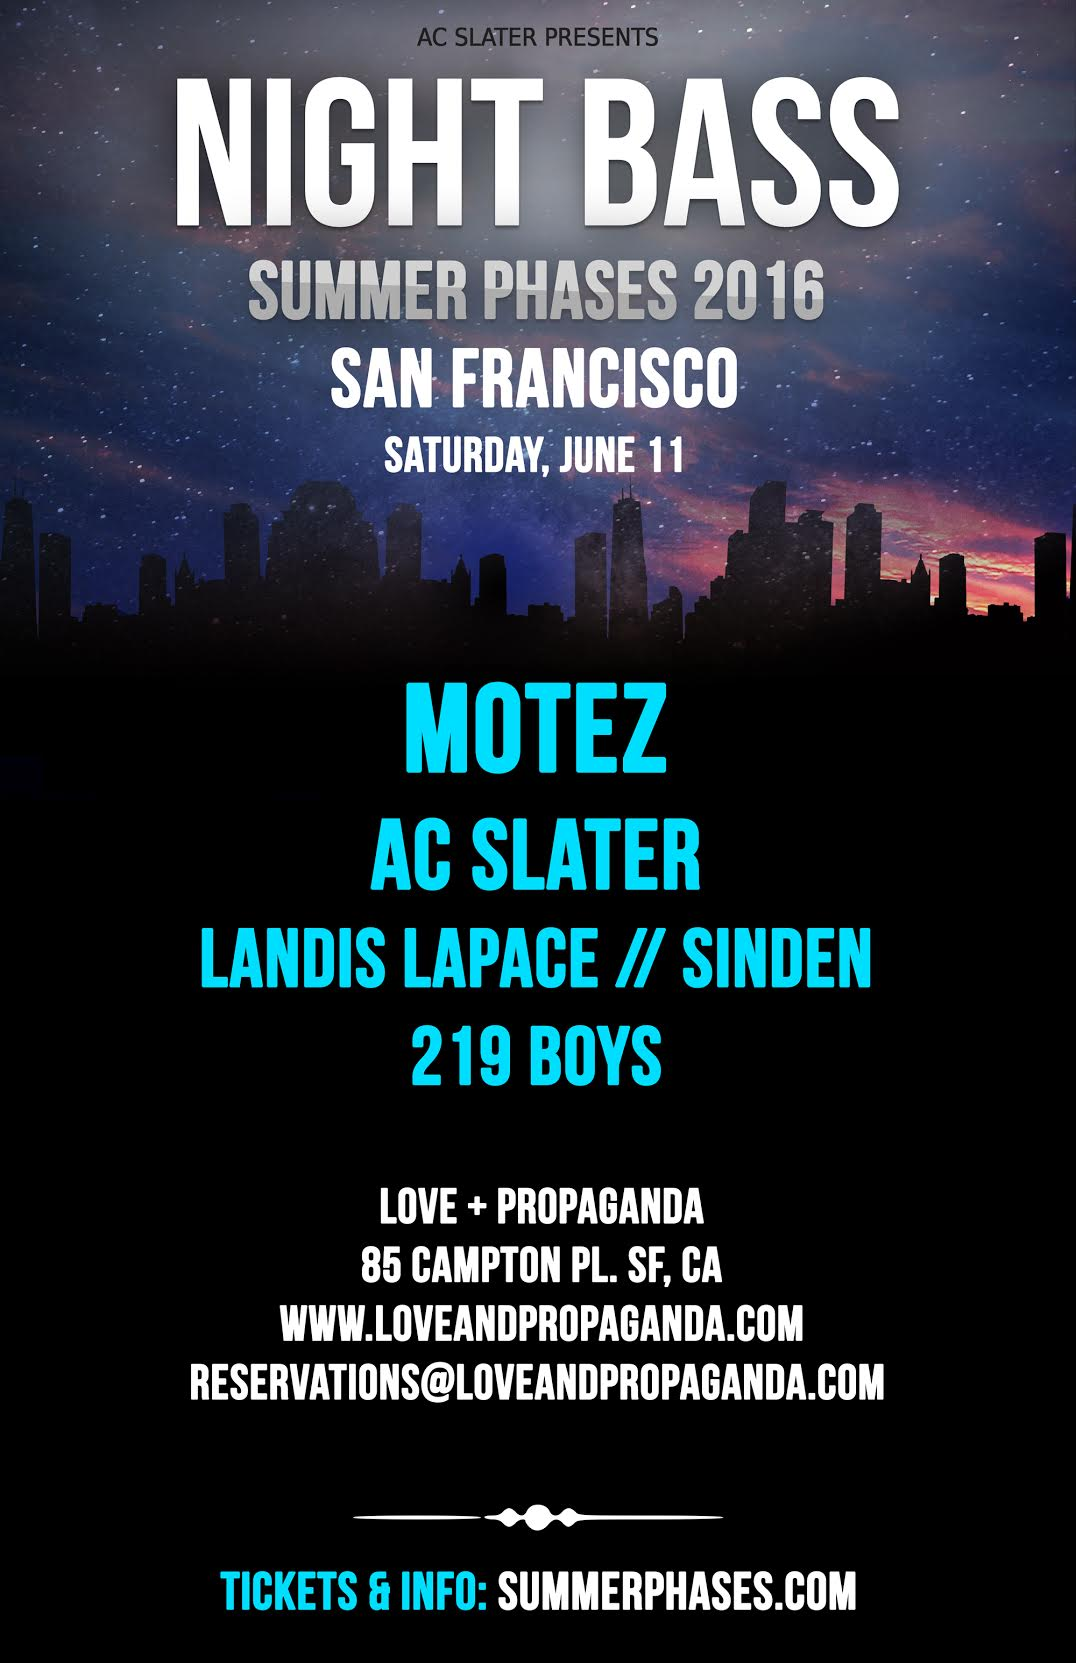 SAN FRANCISCO / JUNE 11